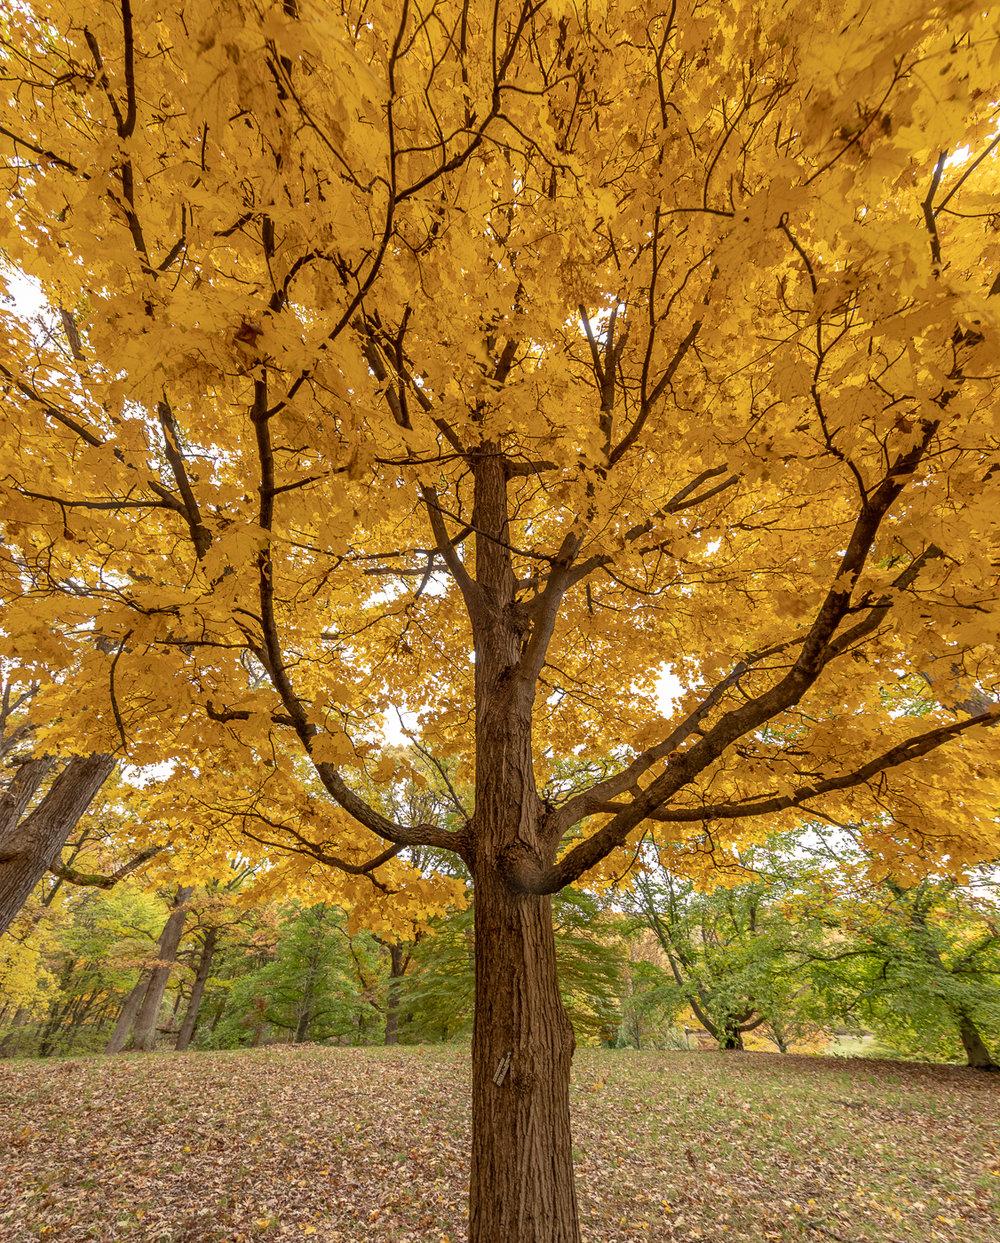 Under the Maple tree